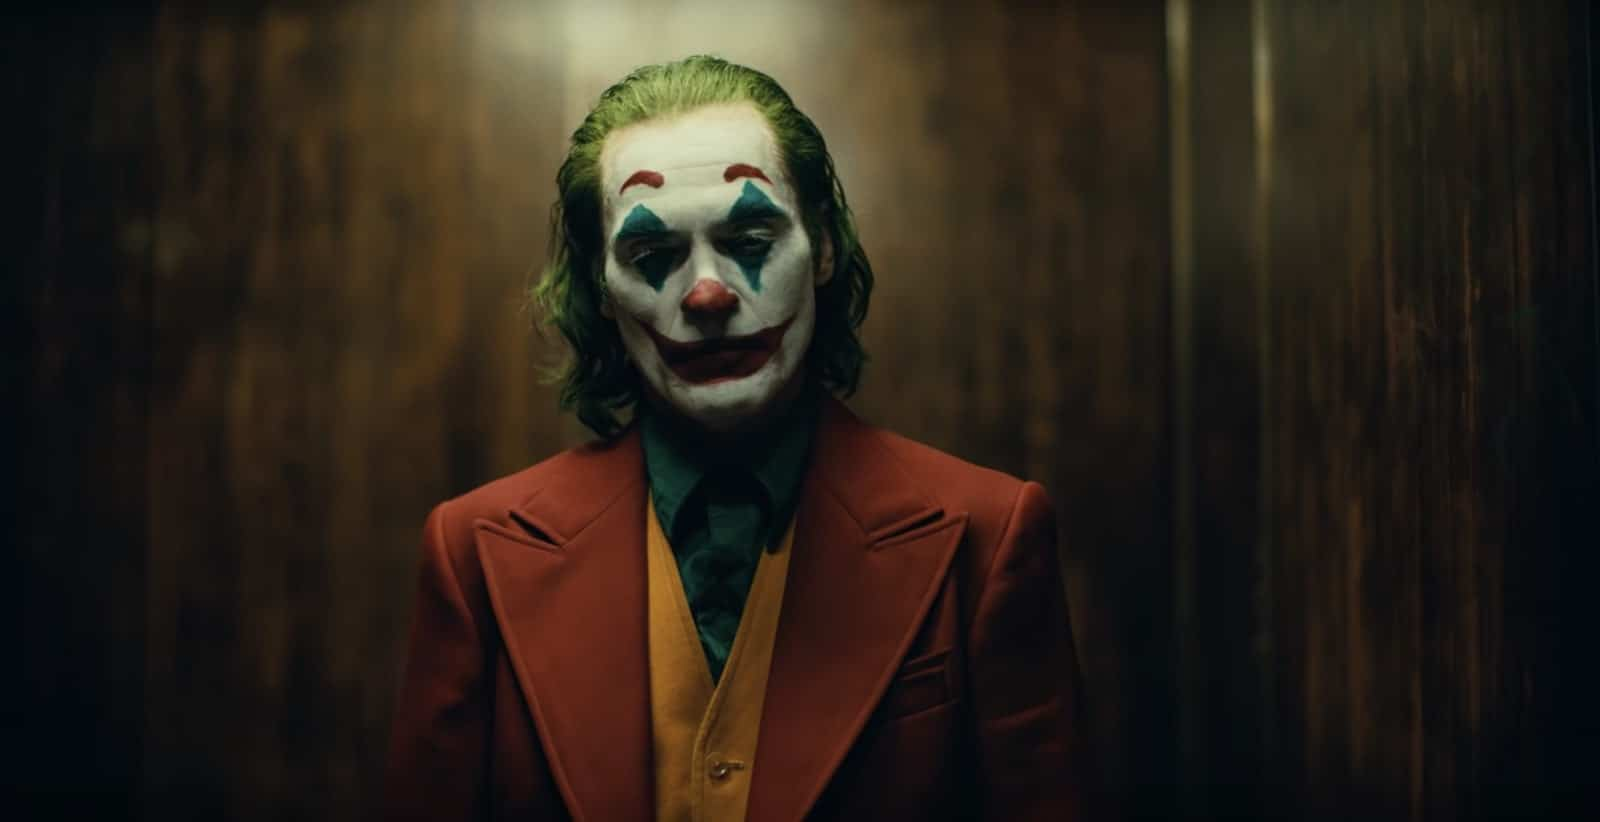 Joker Movie Review - Joker Transformation - StudioBinder - 2